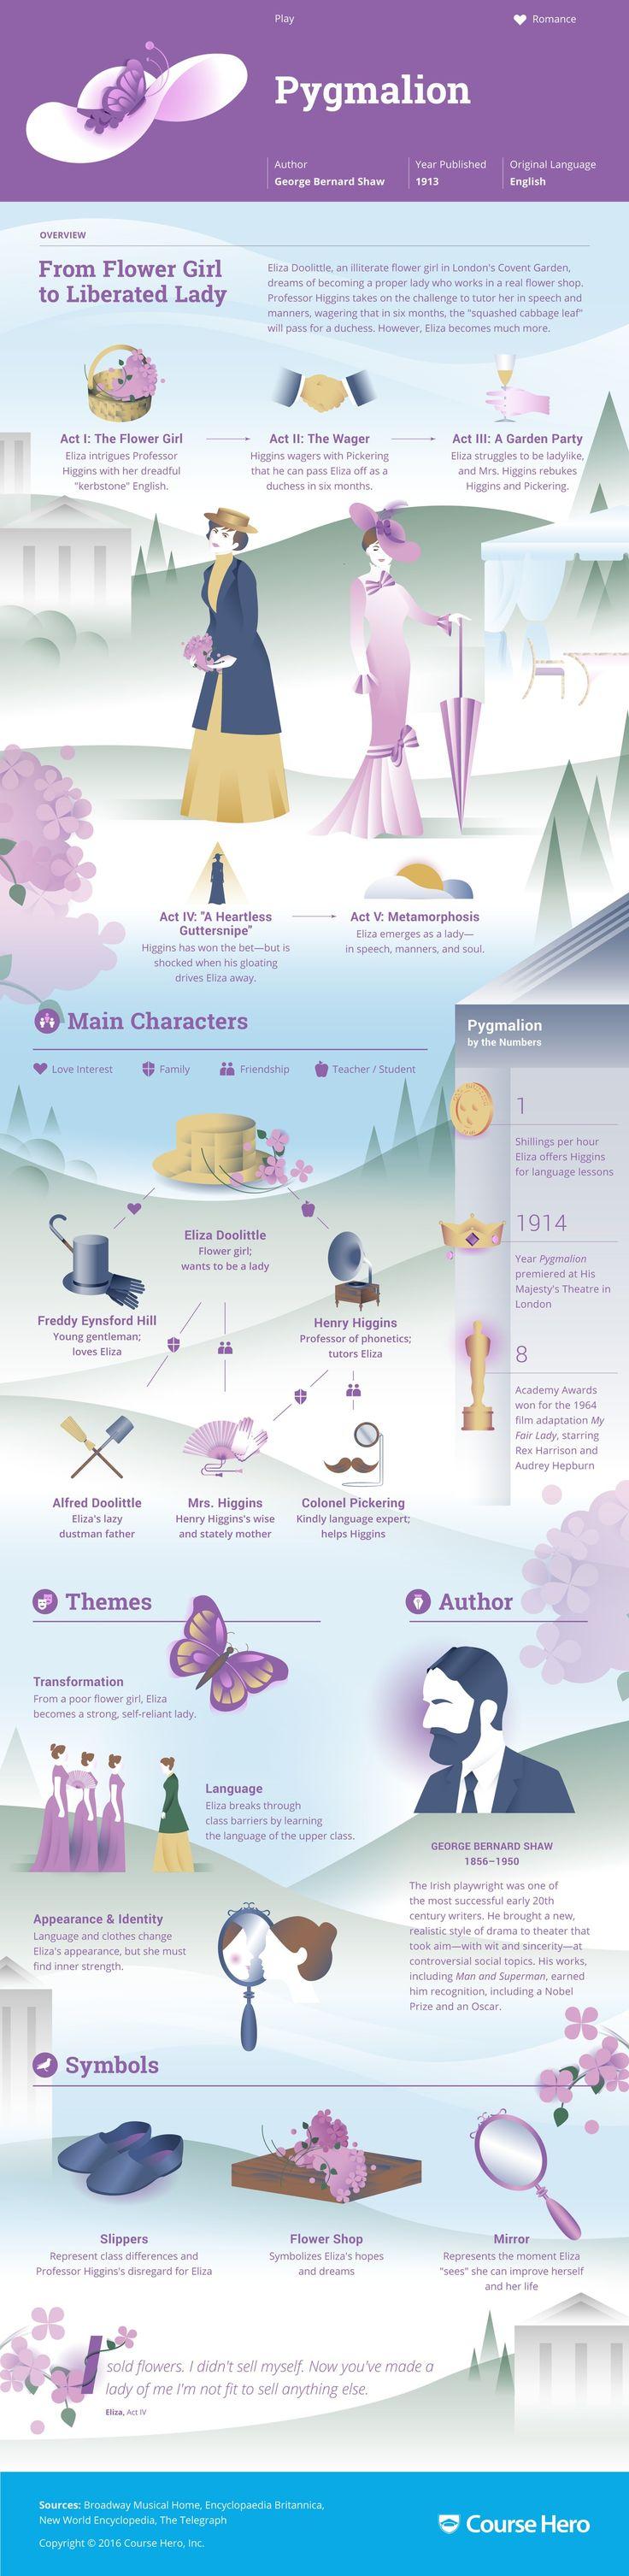 Pygmalion Infographic | Course Hero                              …